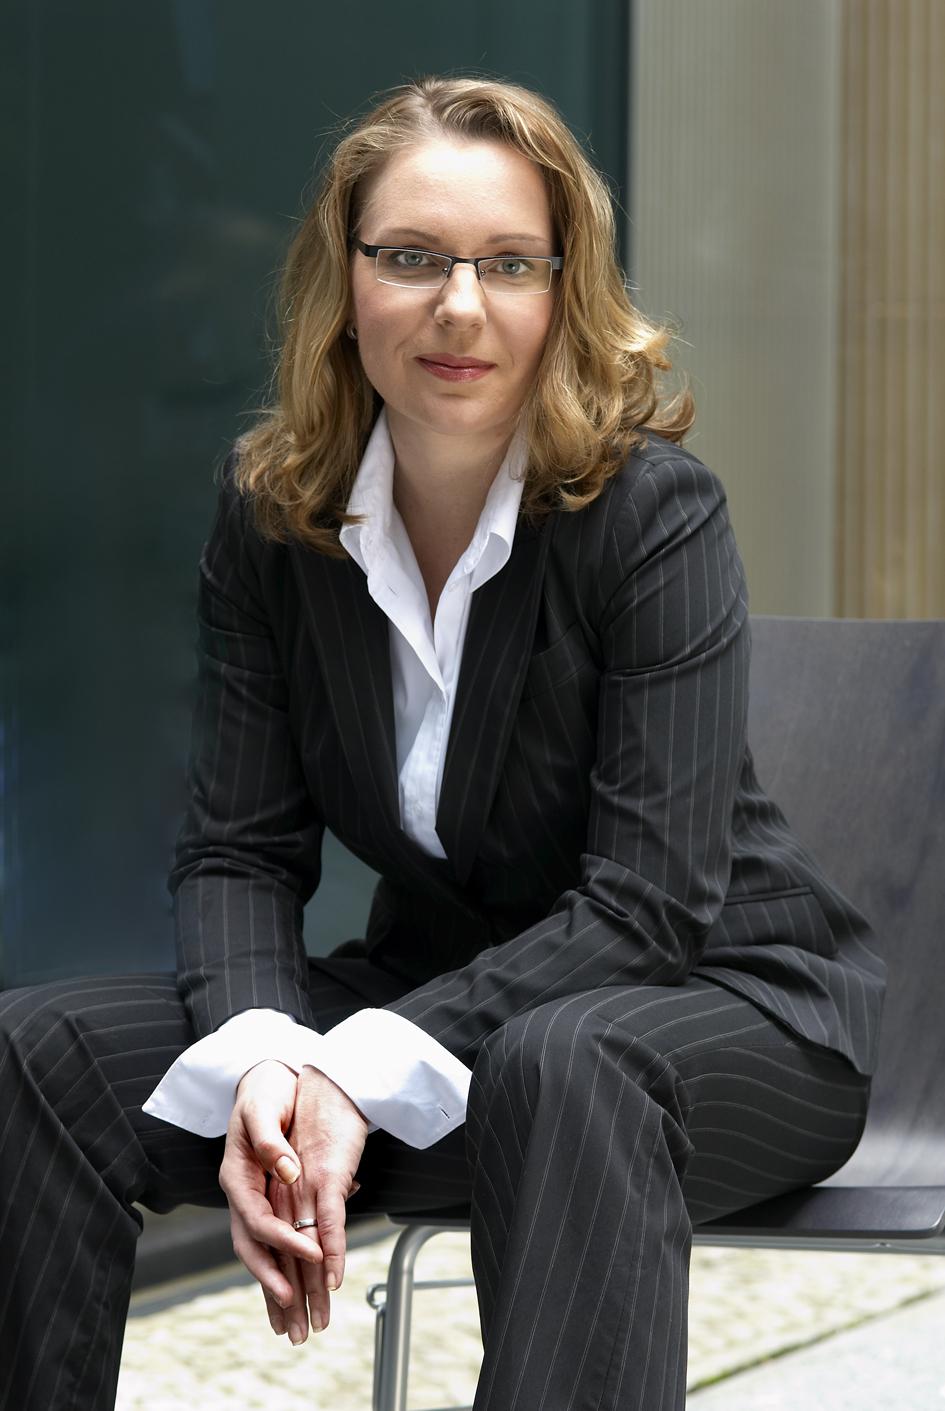 Prof. Dr. Claudia Kemfert, Foto: Sabine Braun, Quelle: DIW